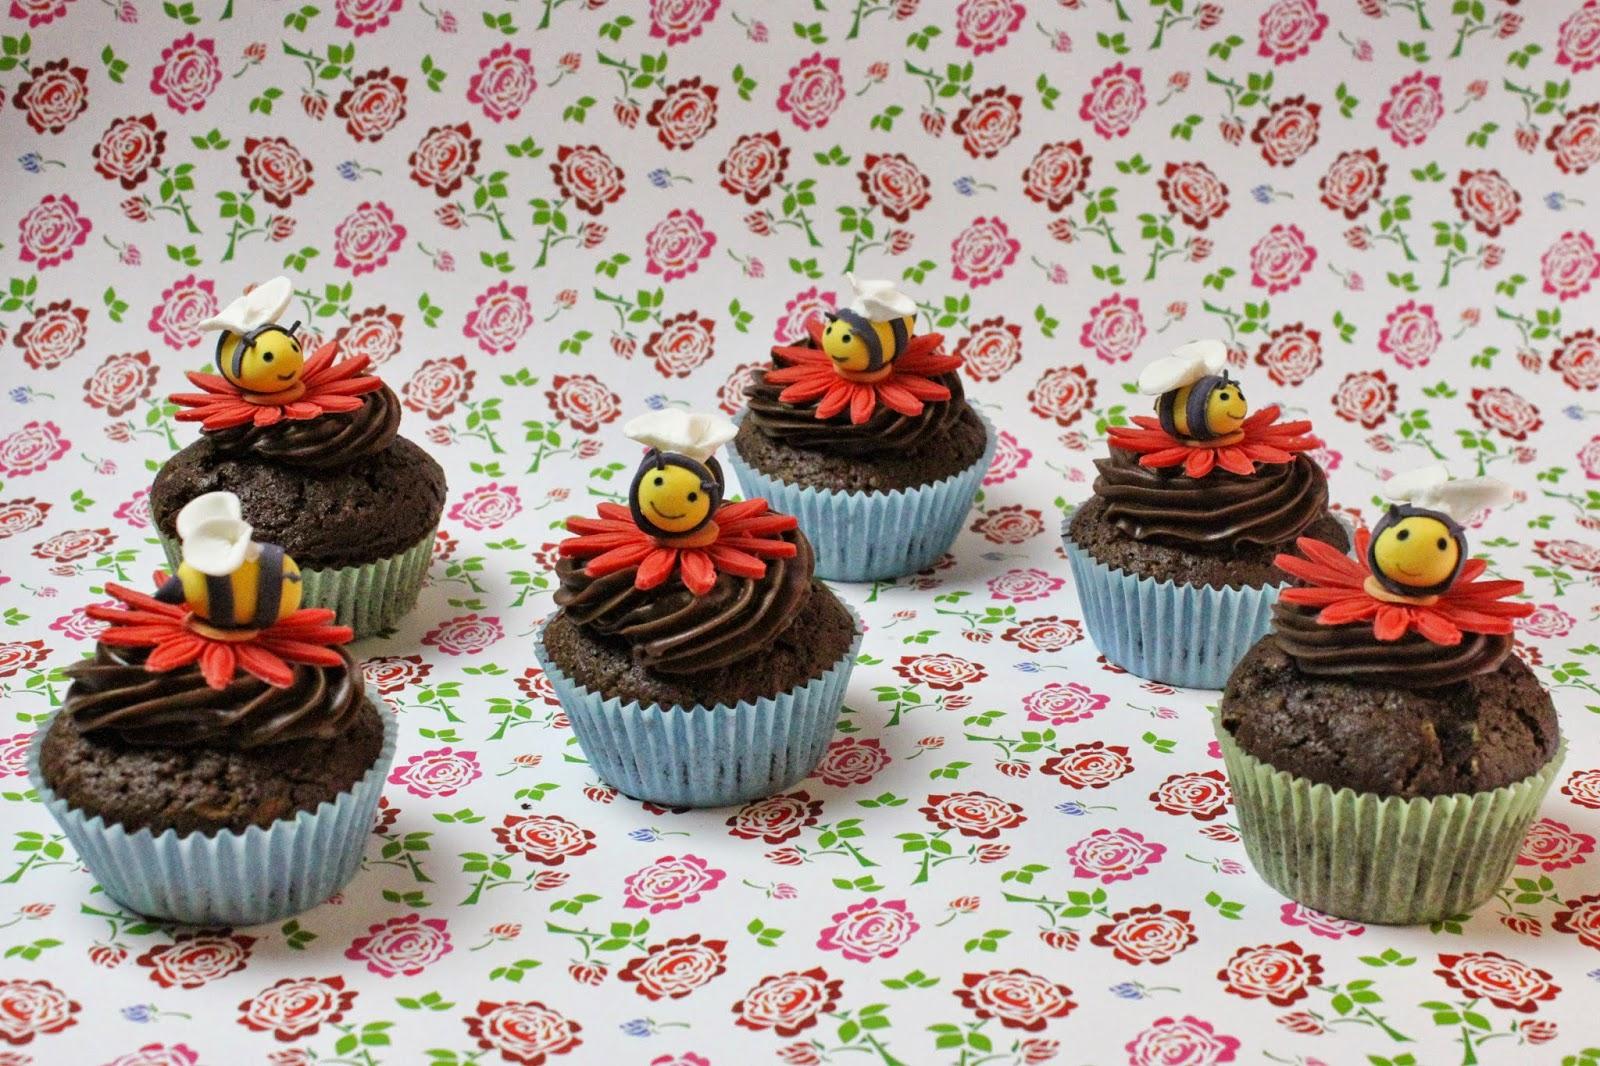 bienen cupcake topping ideen f r kindergeburtstag rezepte jamblog. Black Bedroom Furniture Sets. Home Design Ideas